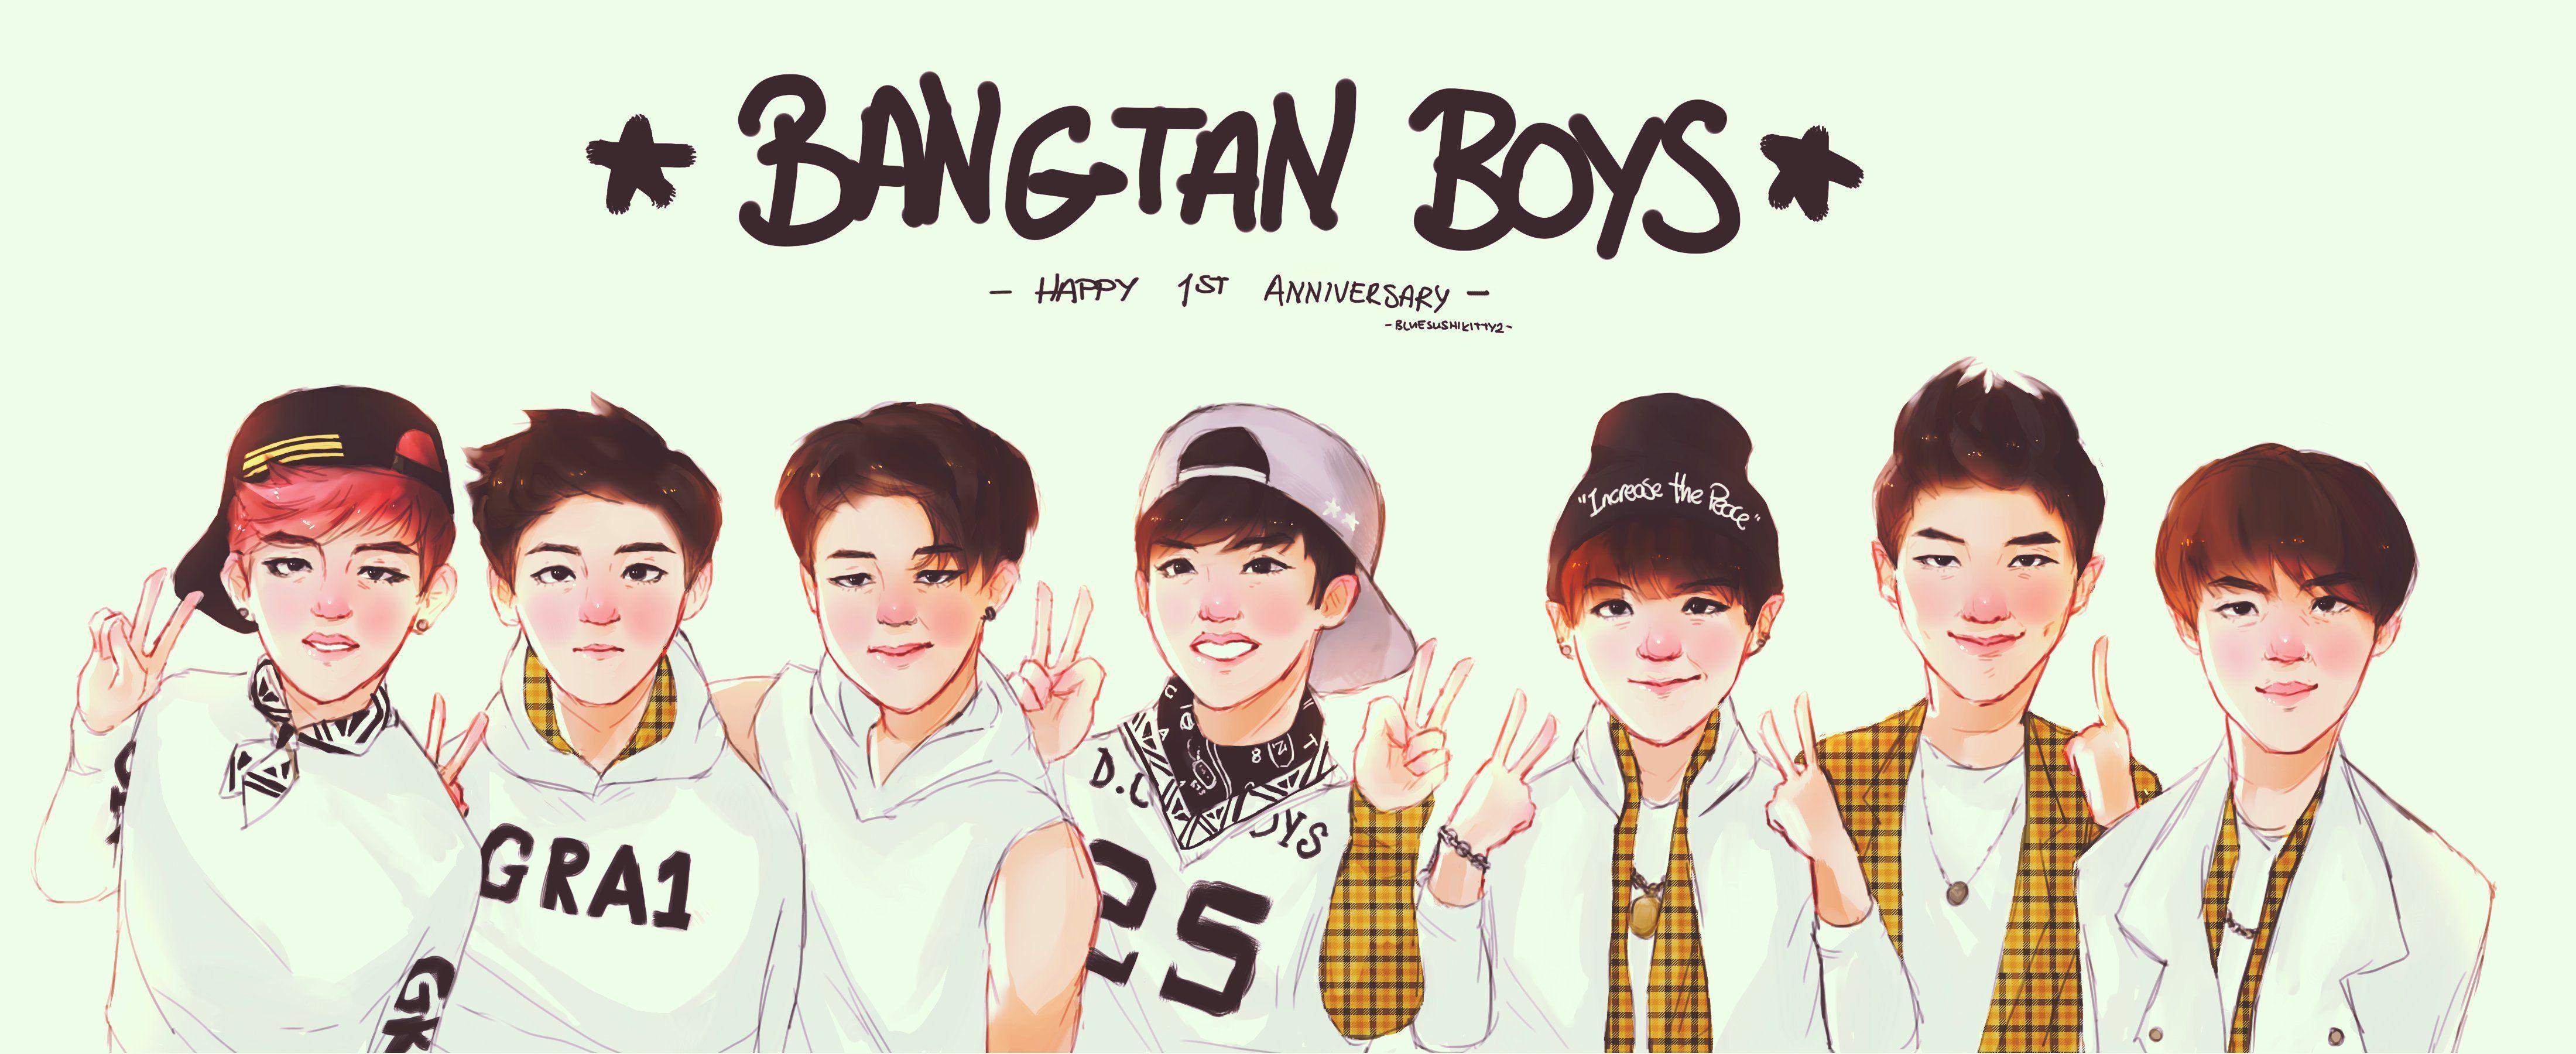 Bts Kpop Wallpaper Posted By Ryan Sellers